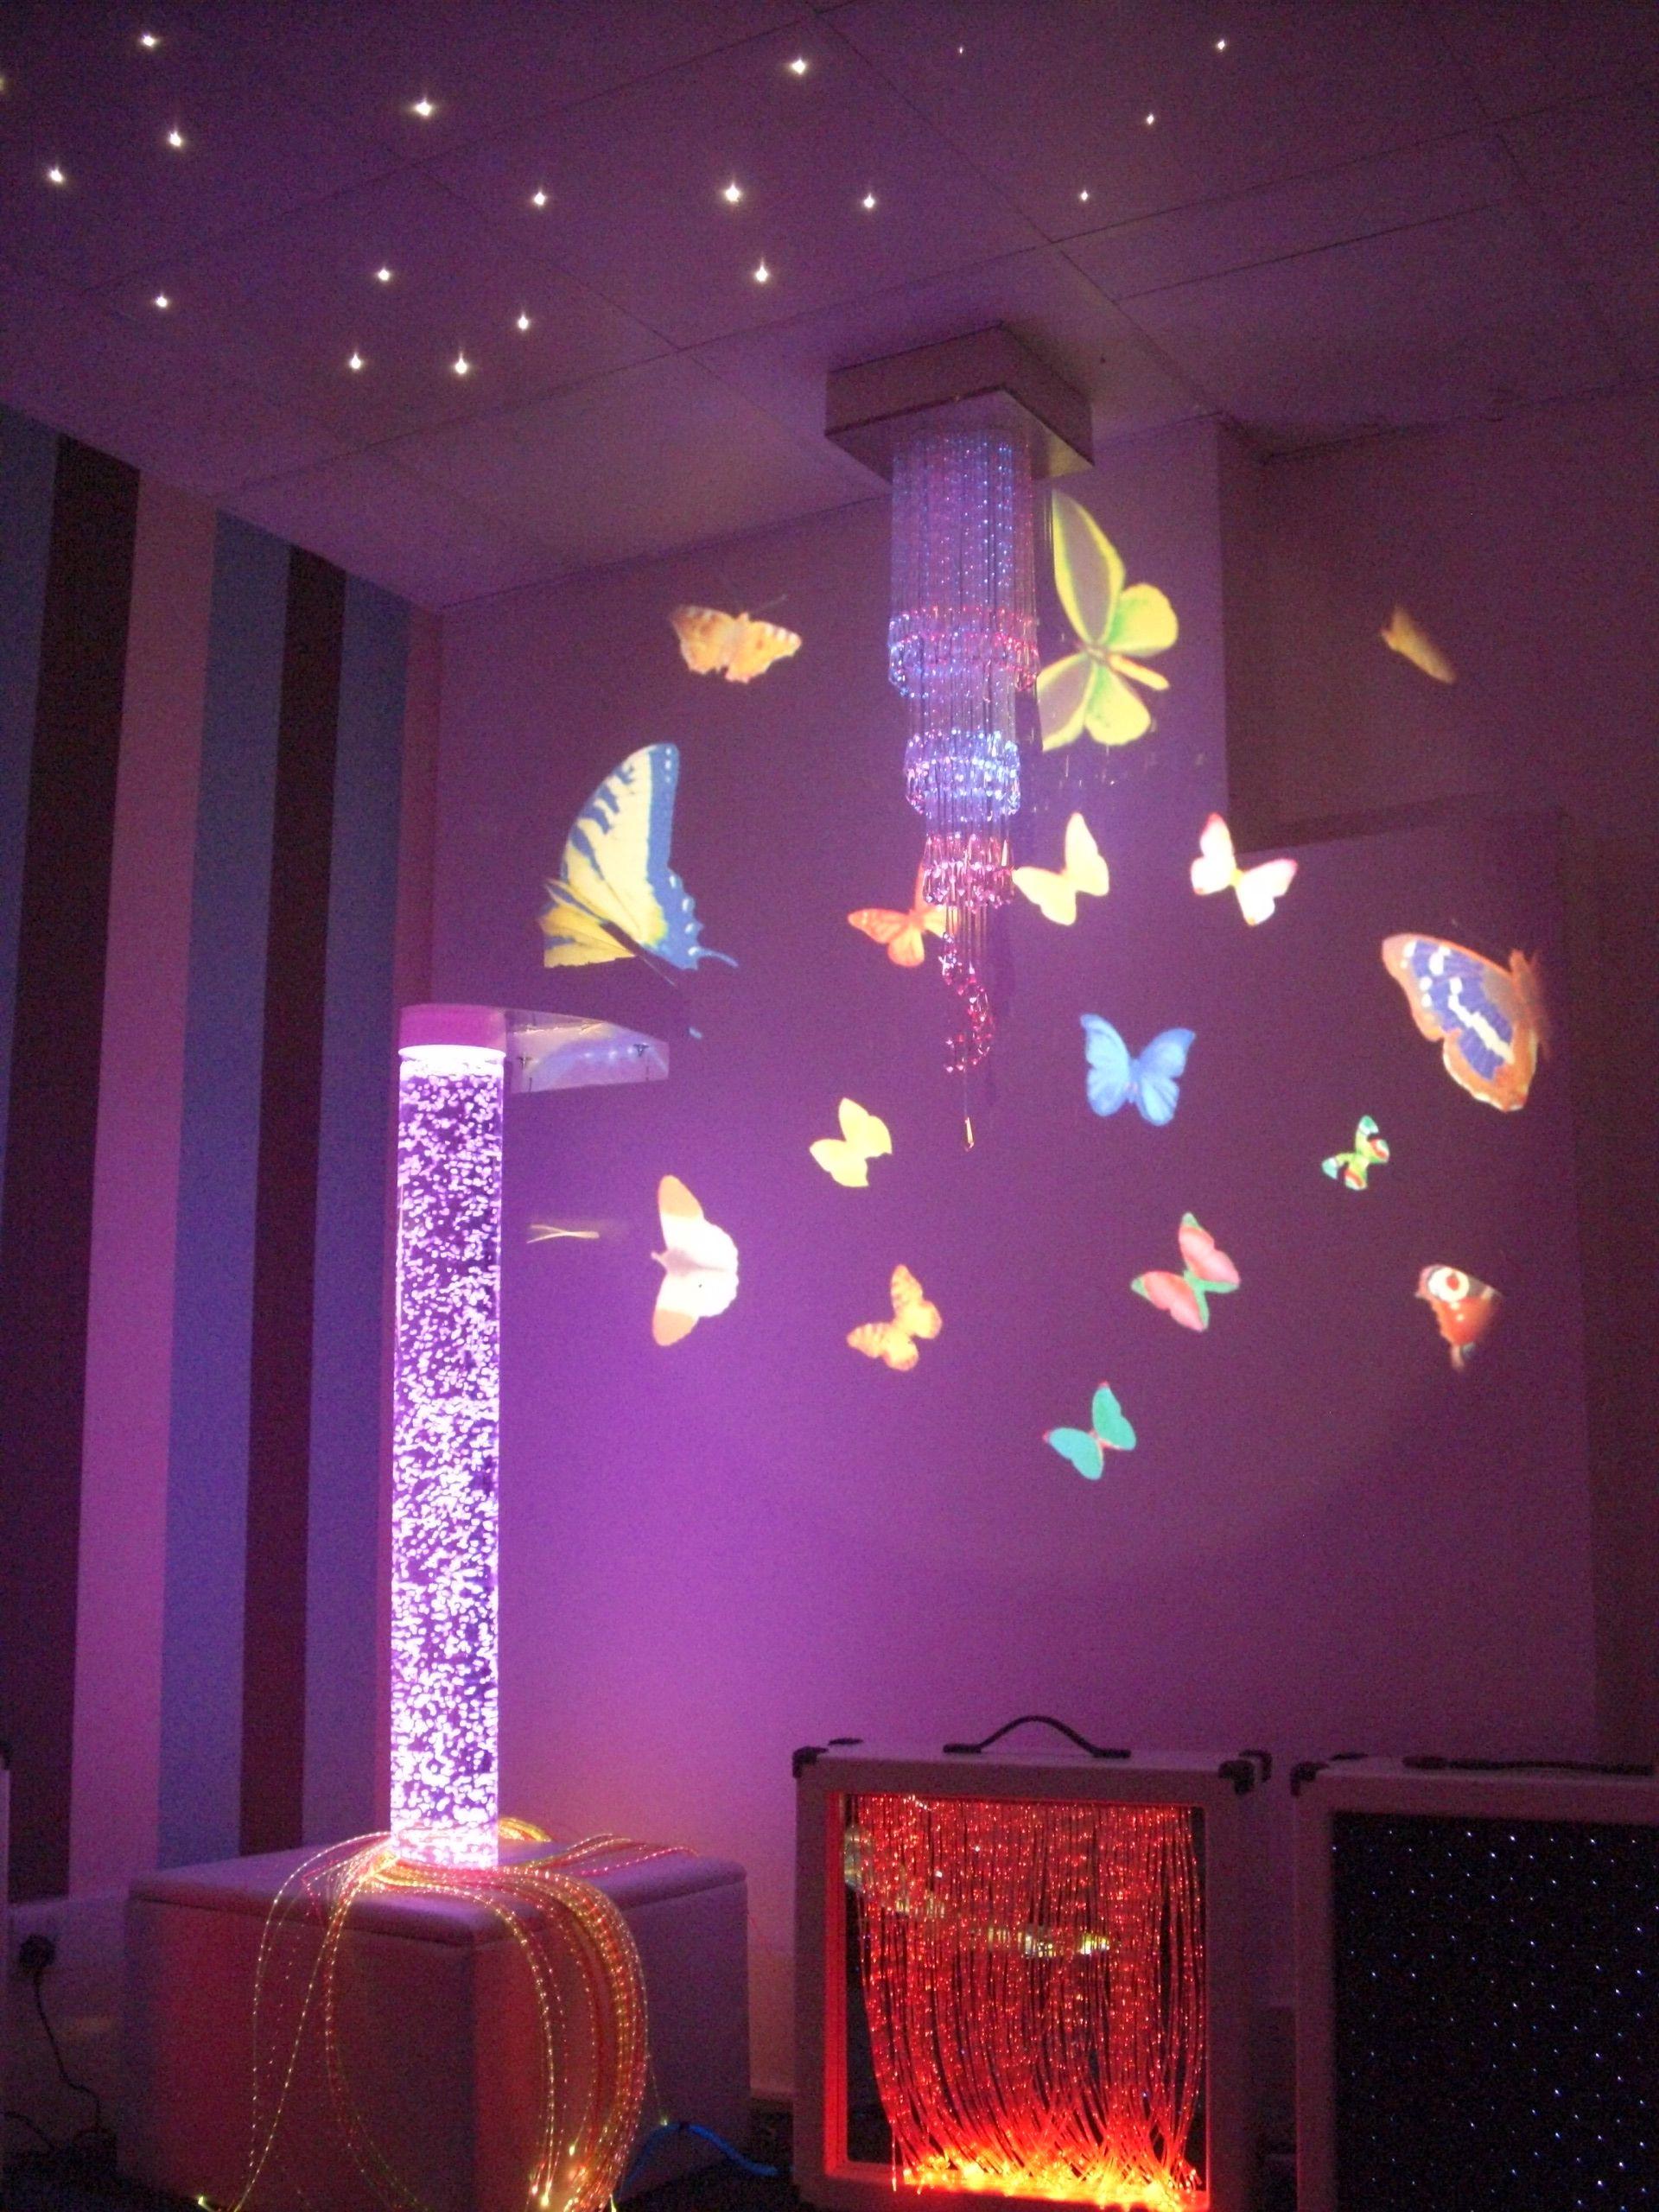 fiber optics lava lamps projected butterflies sensory rooms